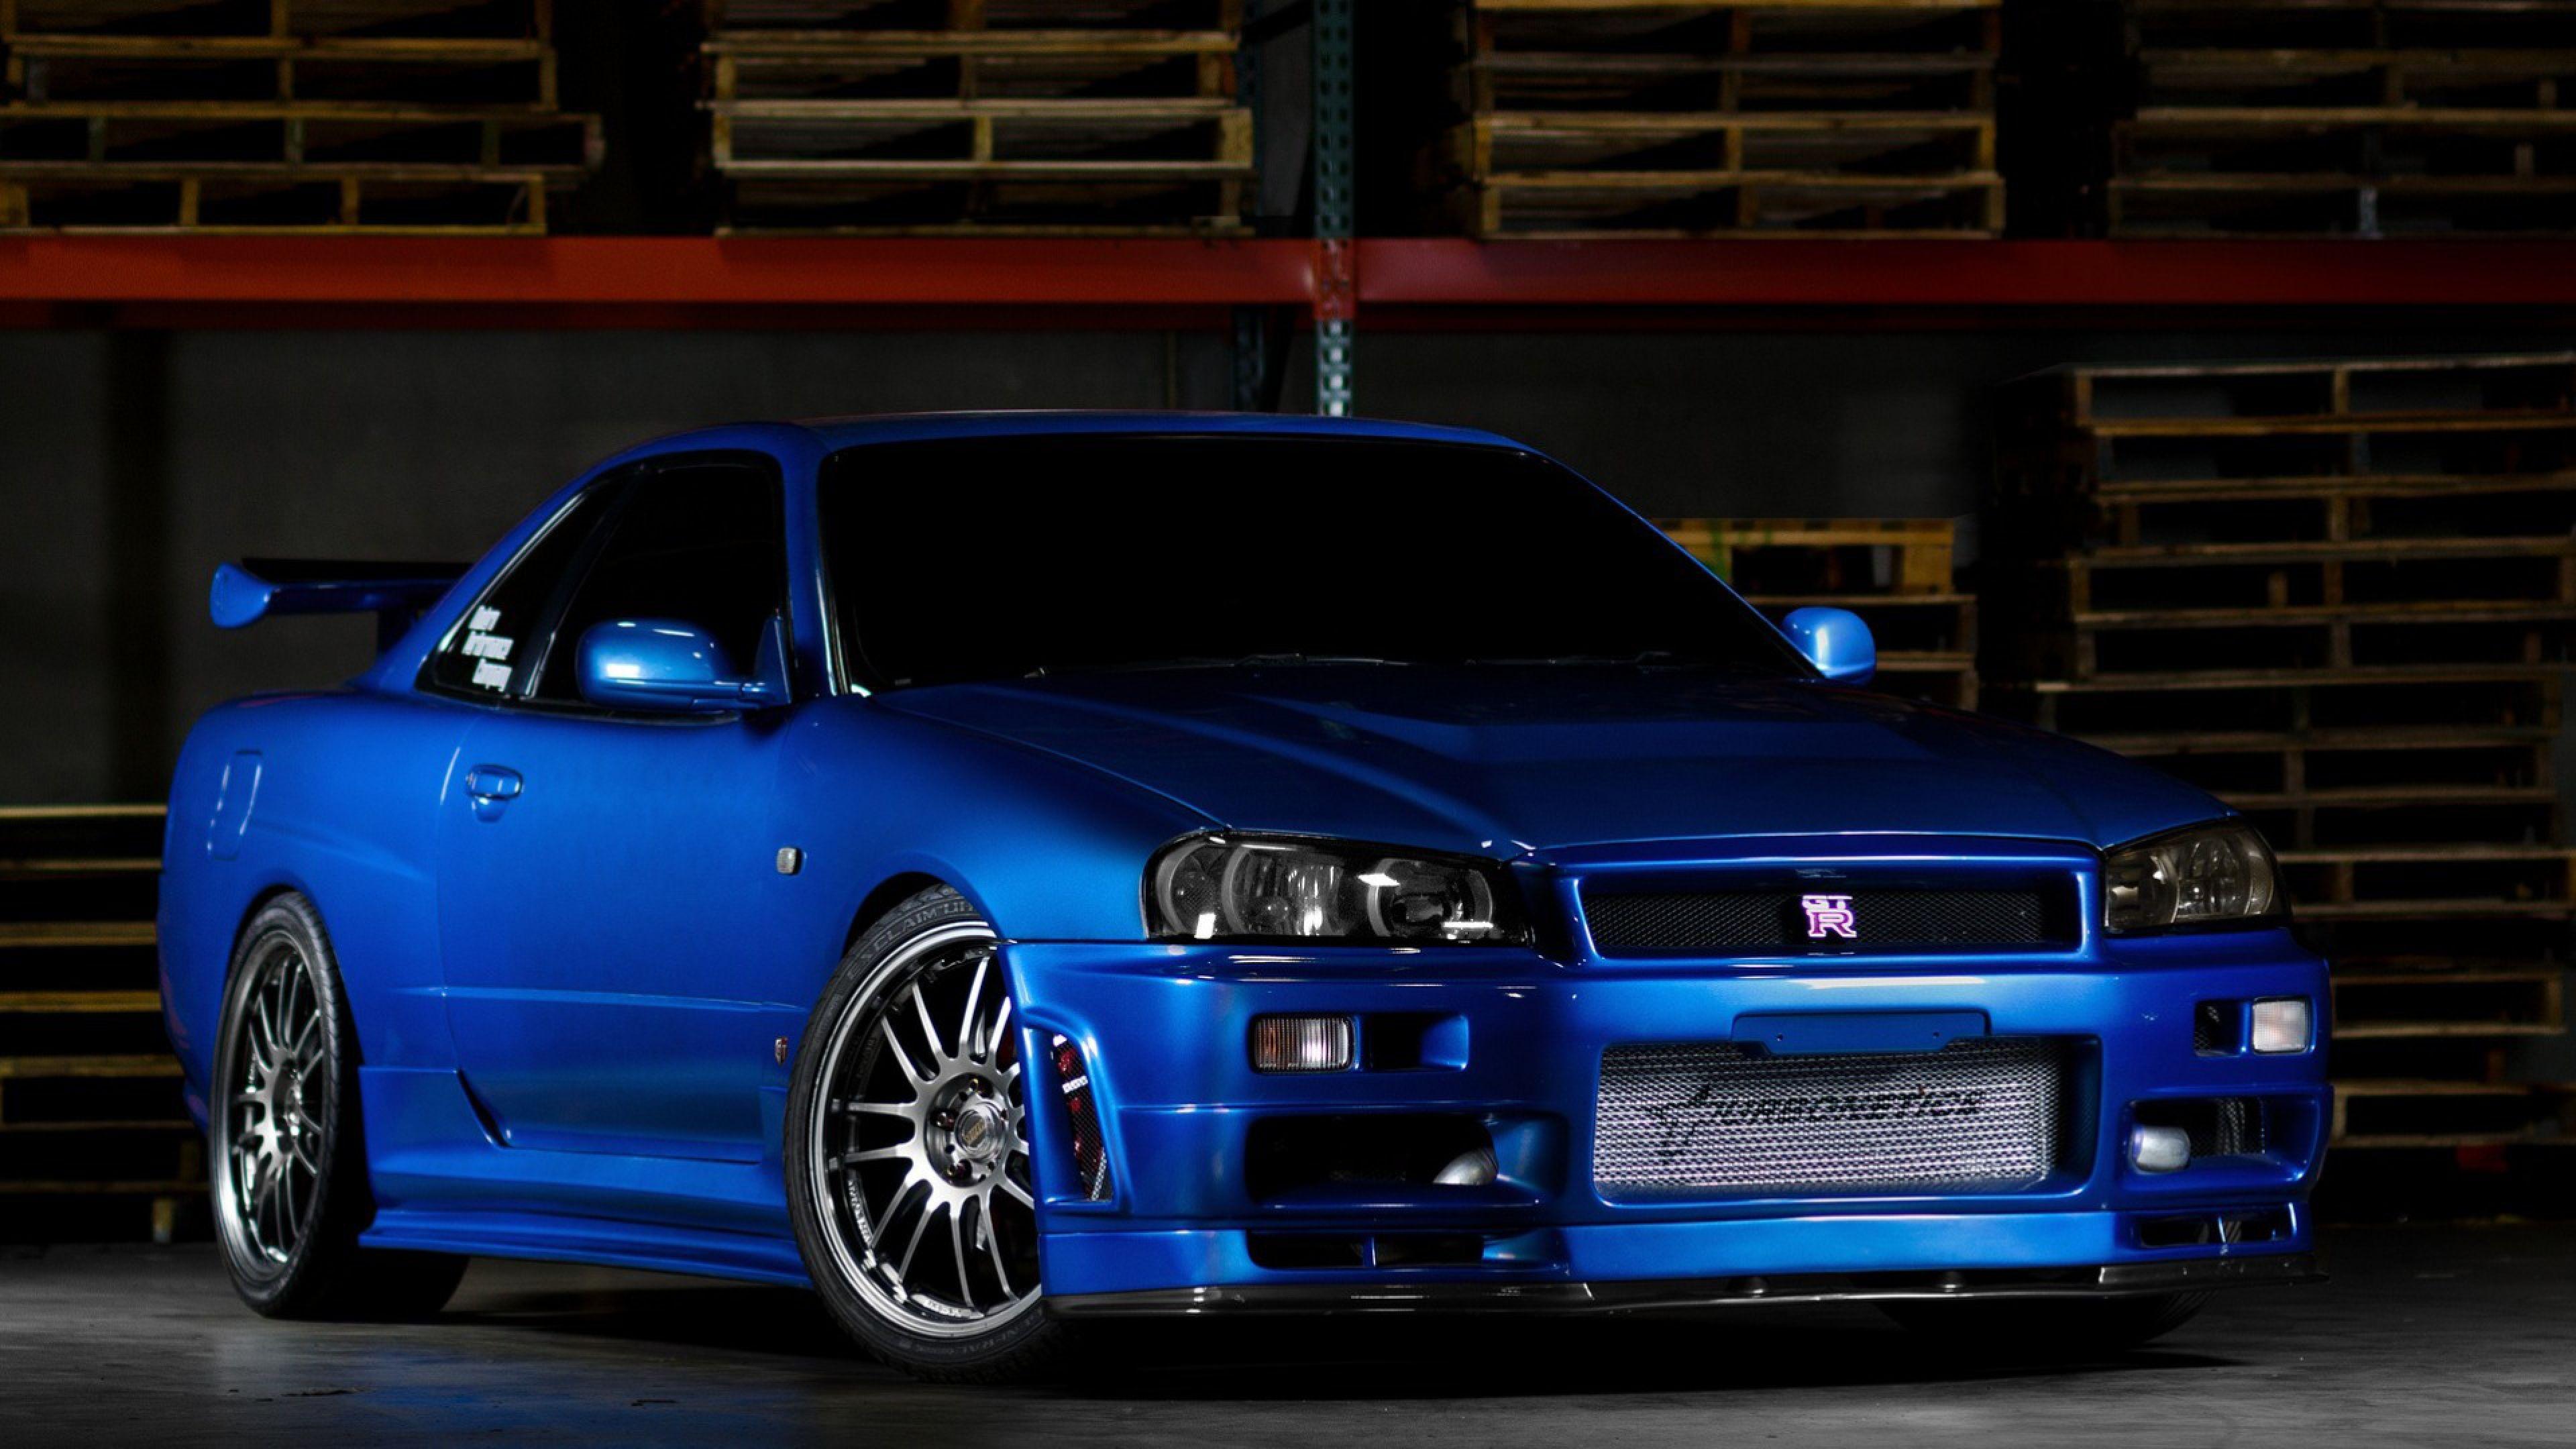 Nissan Skyline GTR Wallpapers Group (87+)